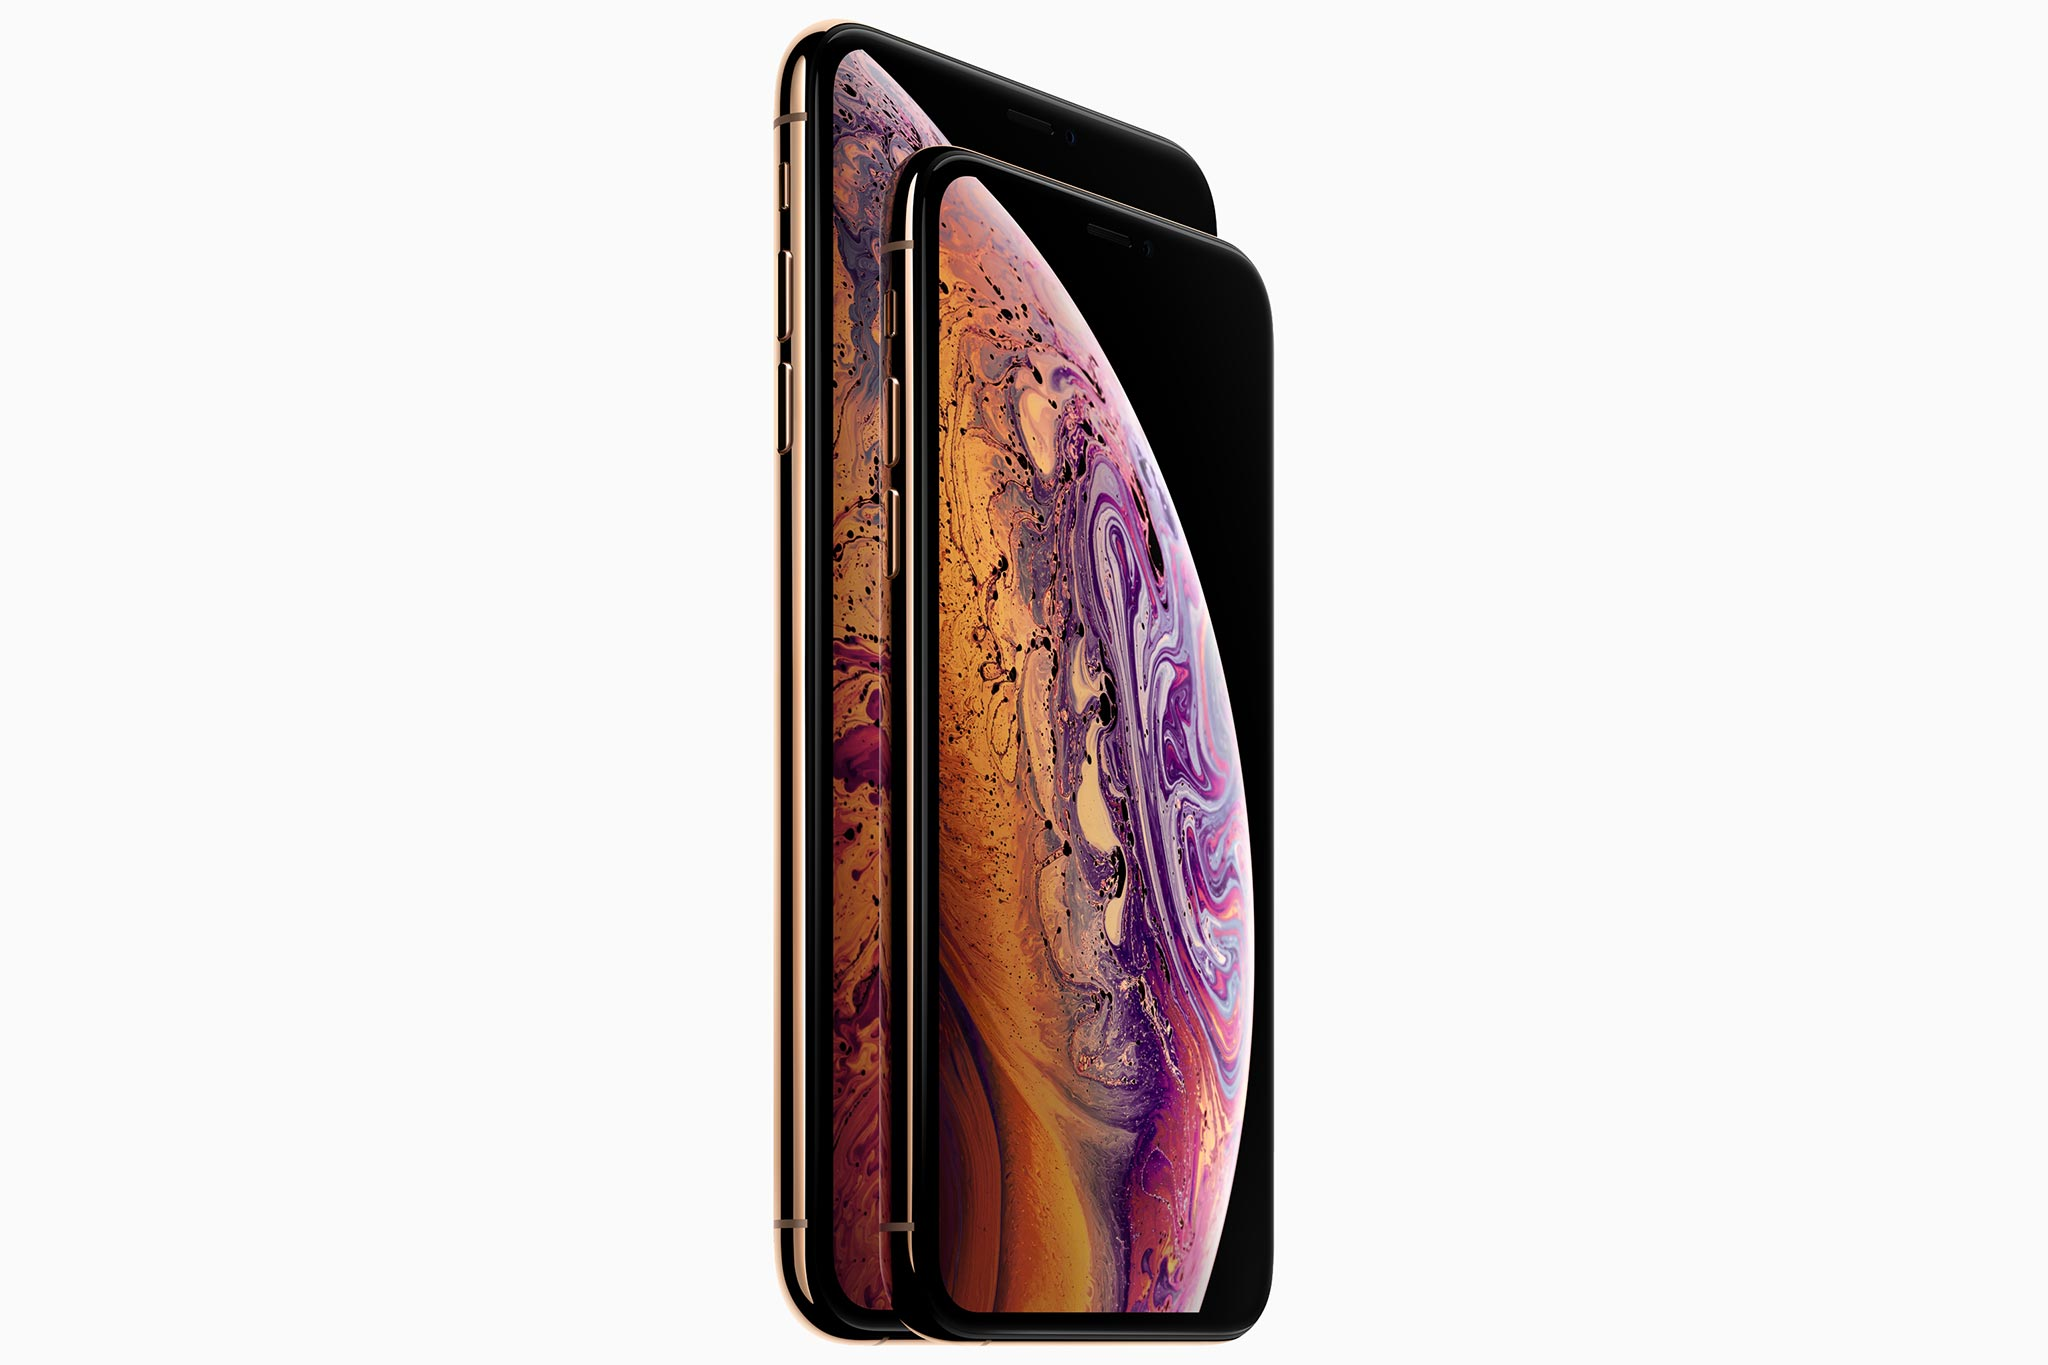 Apple-iPhone-Xs_tinhte.jpg